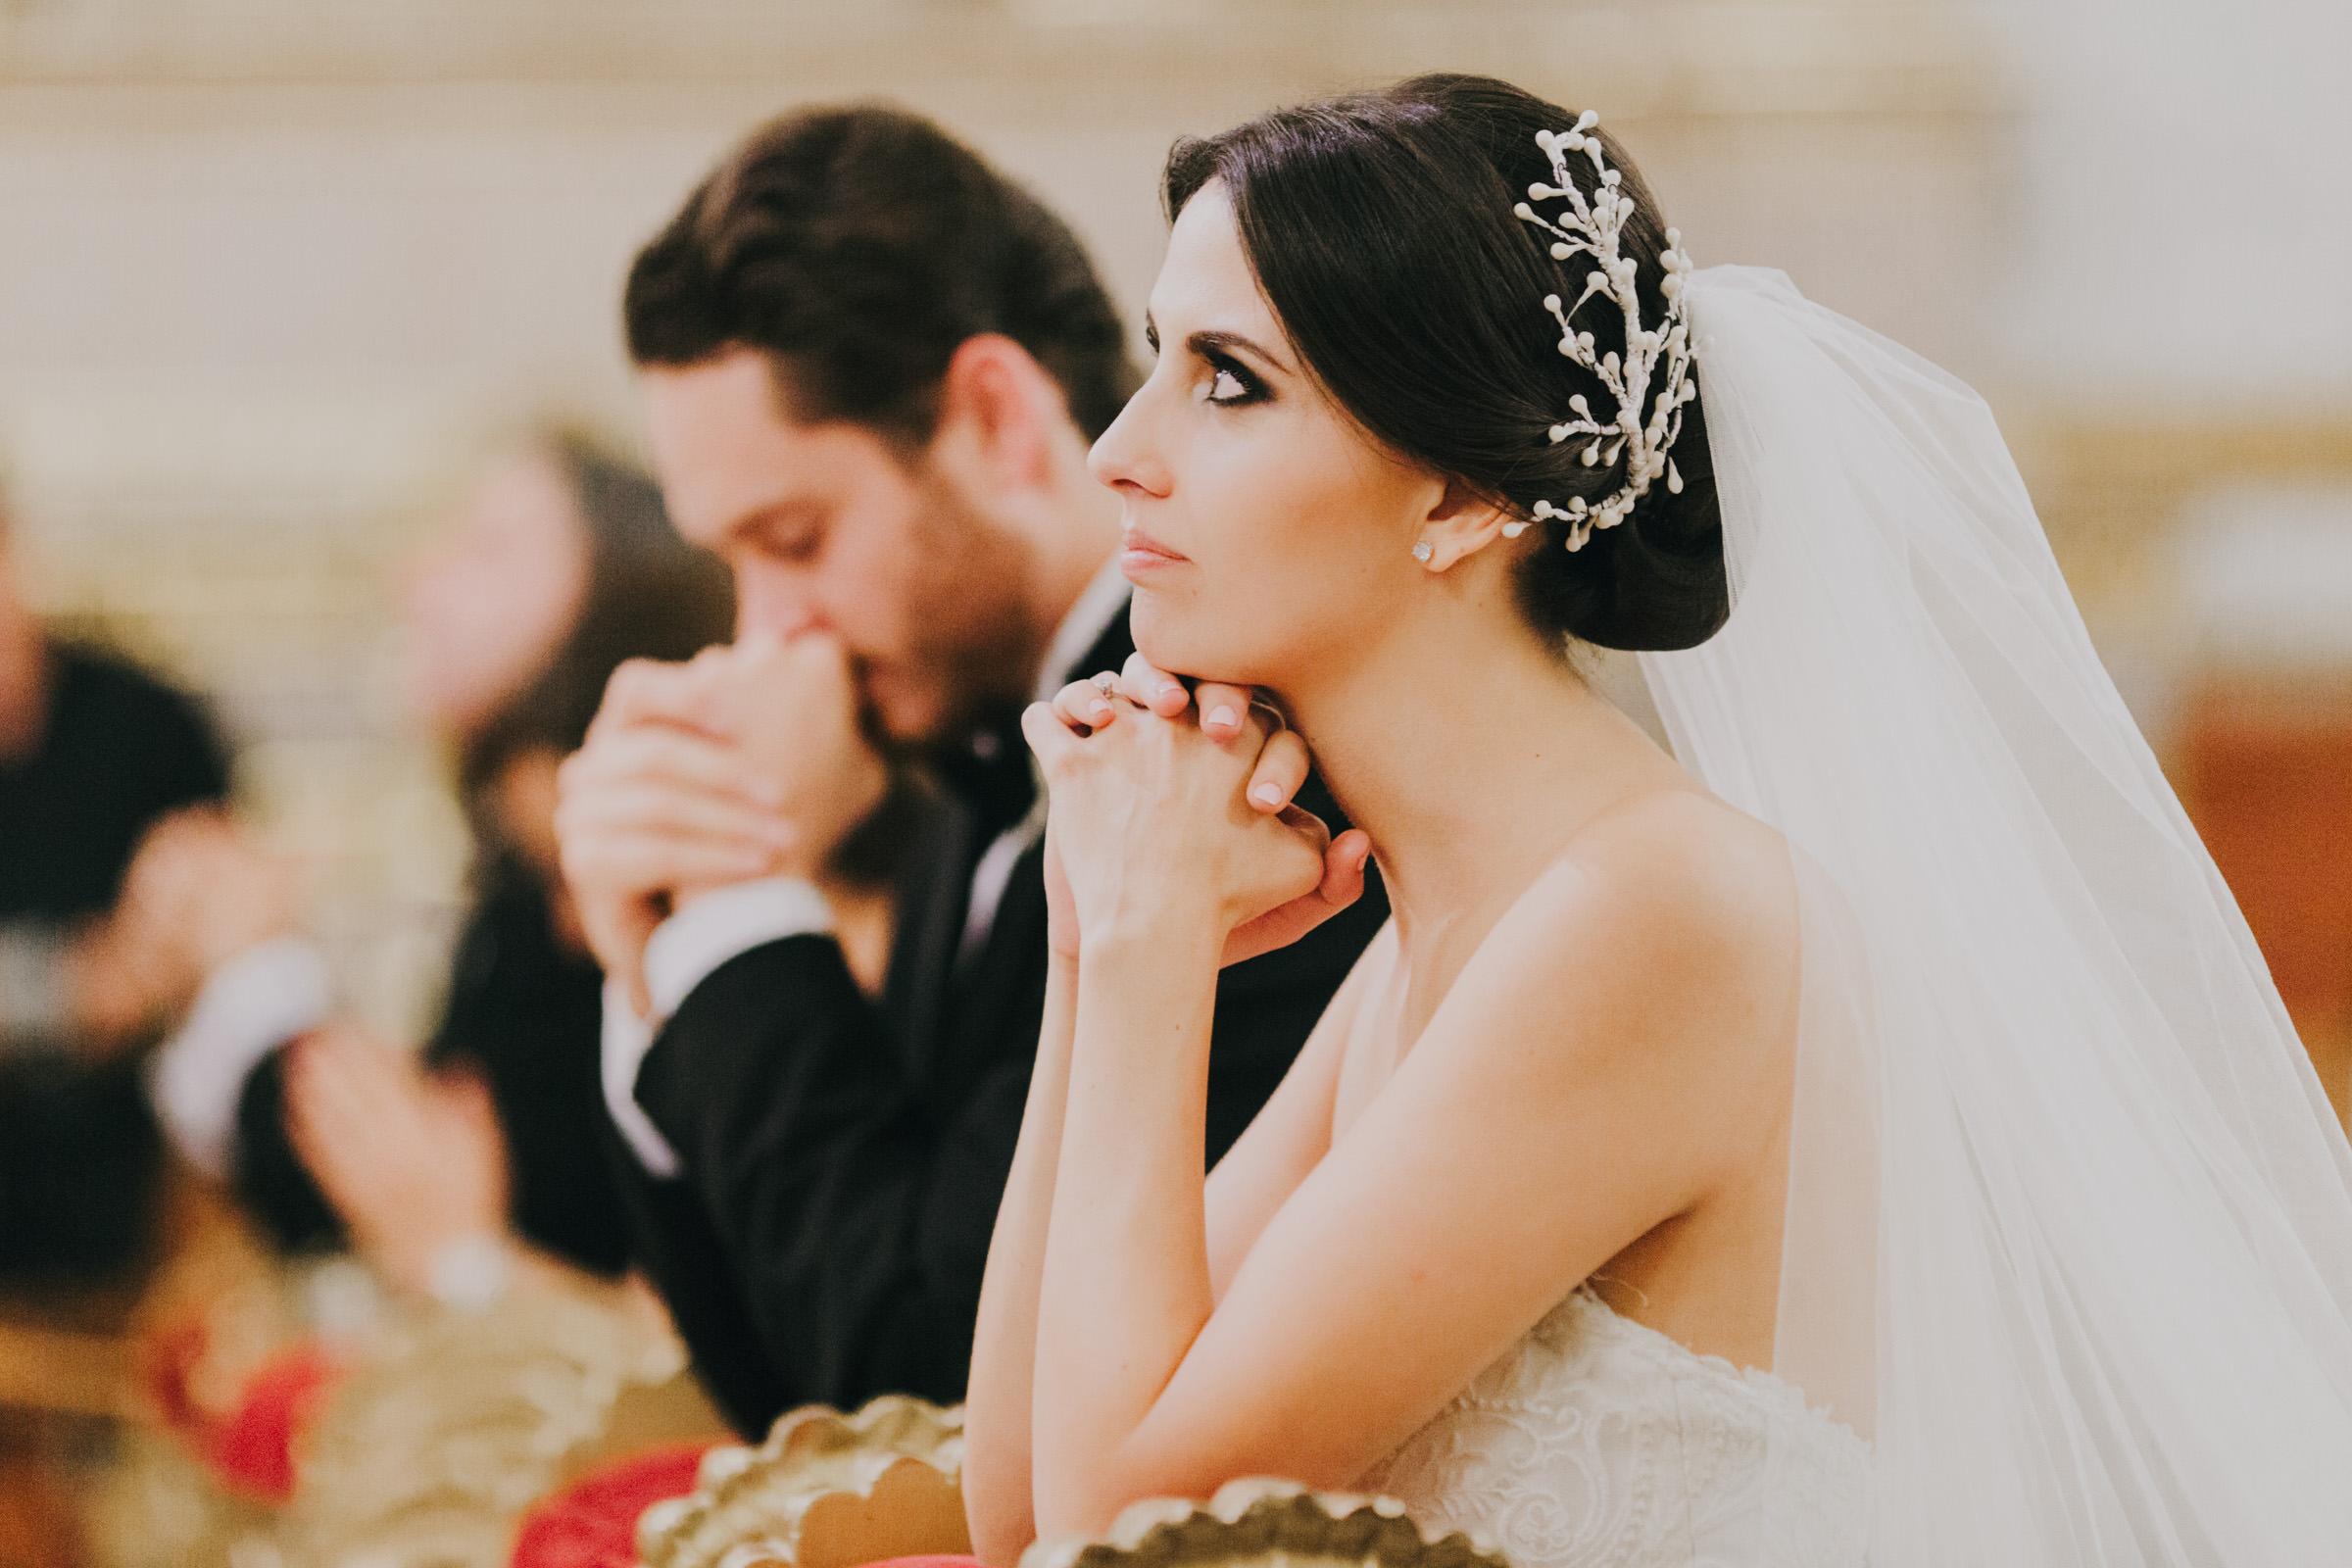 irapuato-boda-fotografia-jardines-alcalde-guanajuato-paulina-juan-pedro--116.jpg